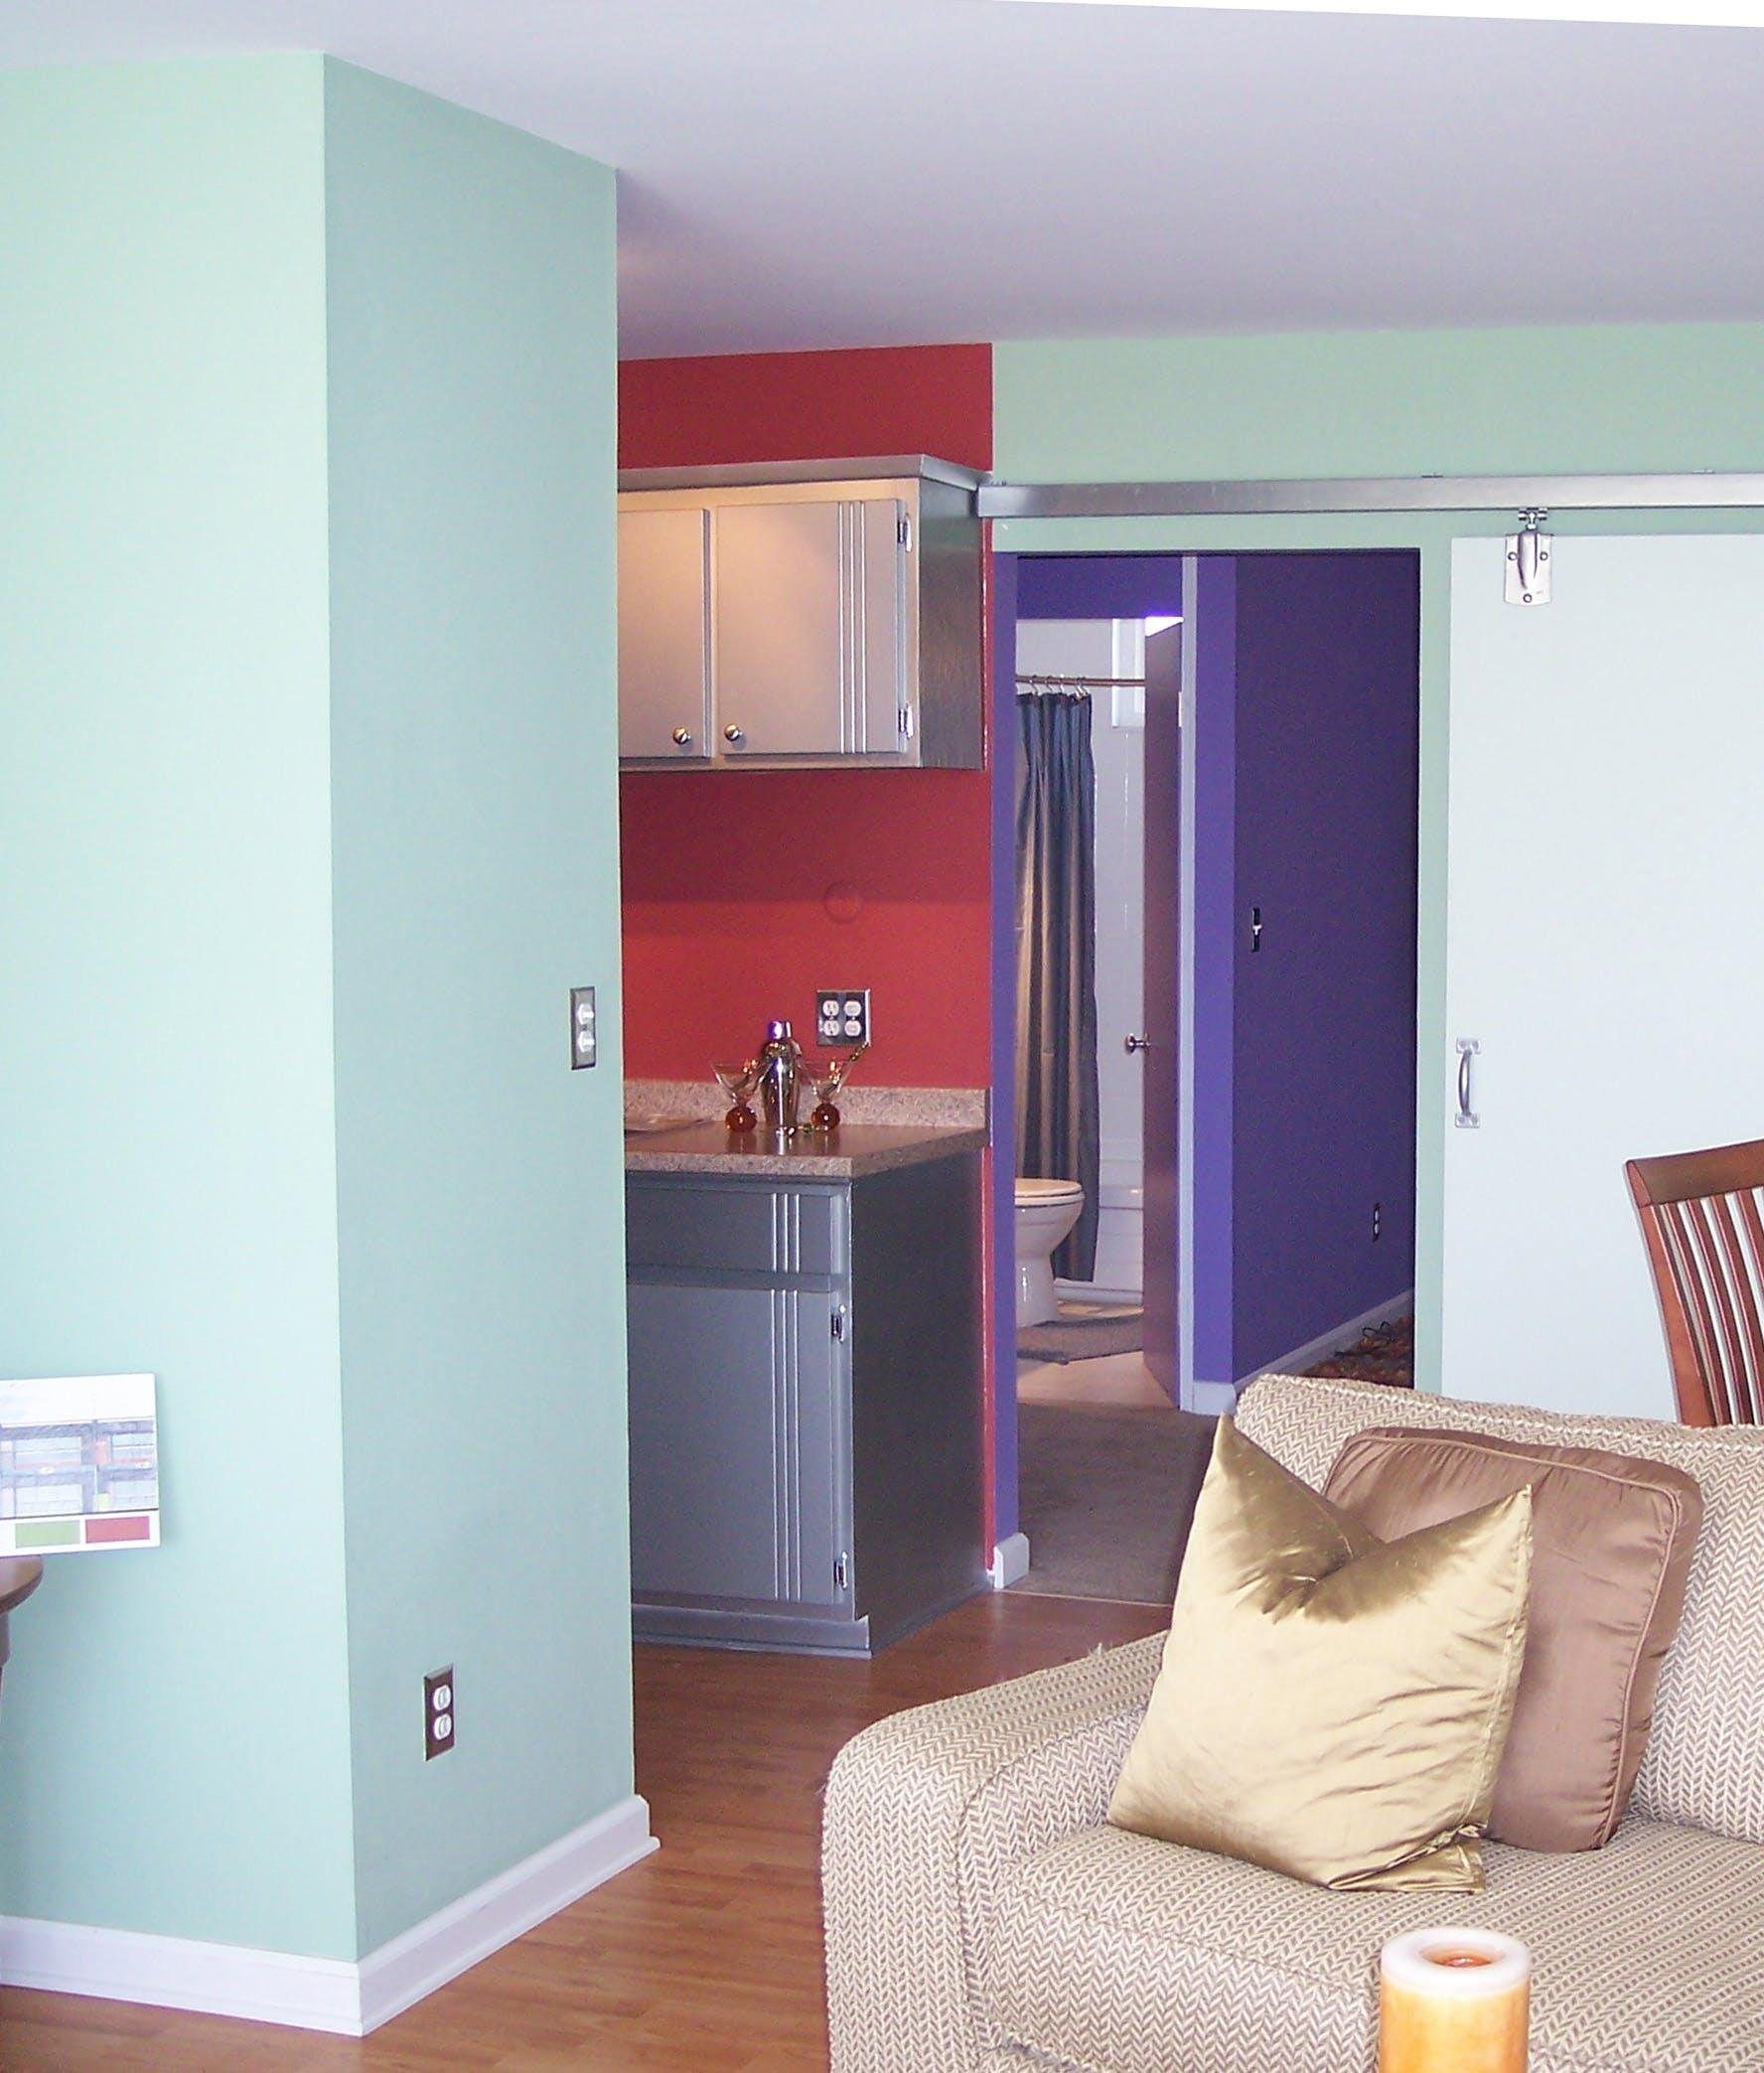 Urbane Apartments: Peter F. Gormley NCARB, LEED AP